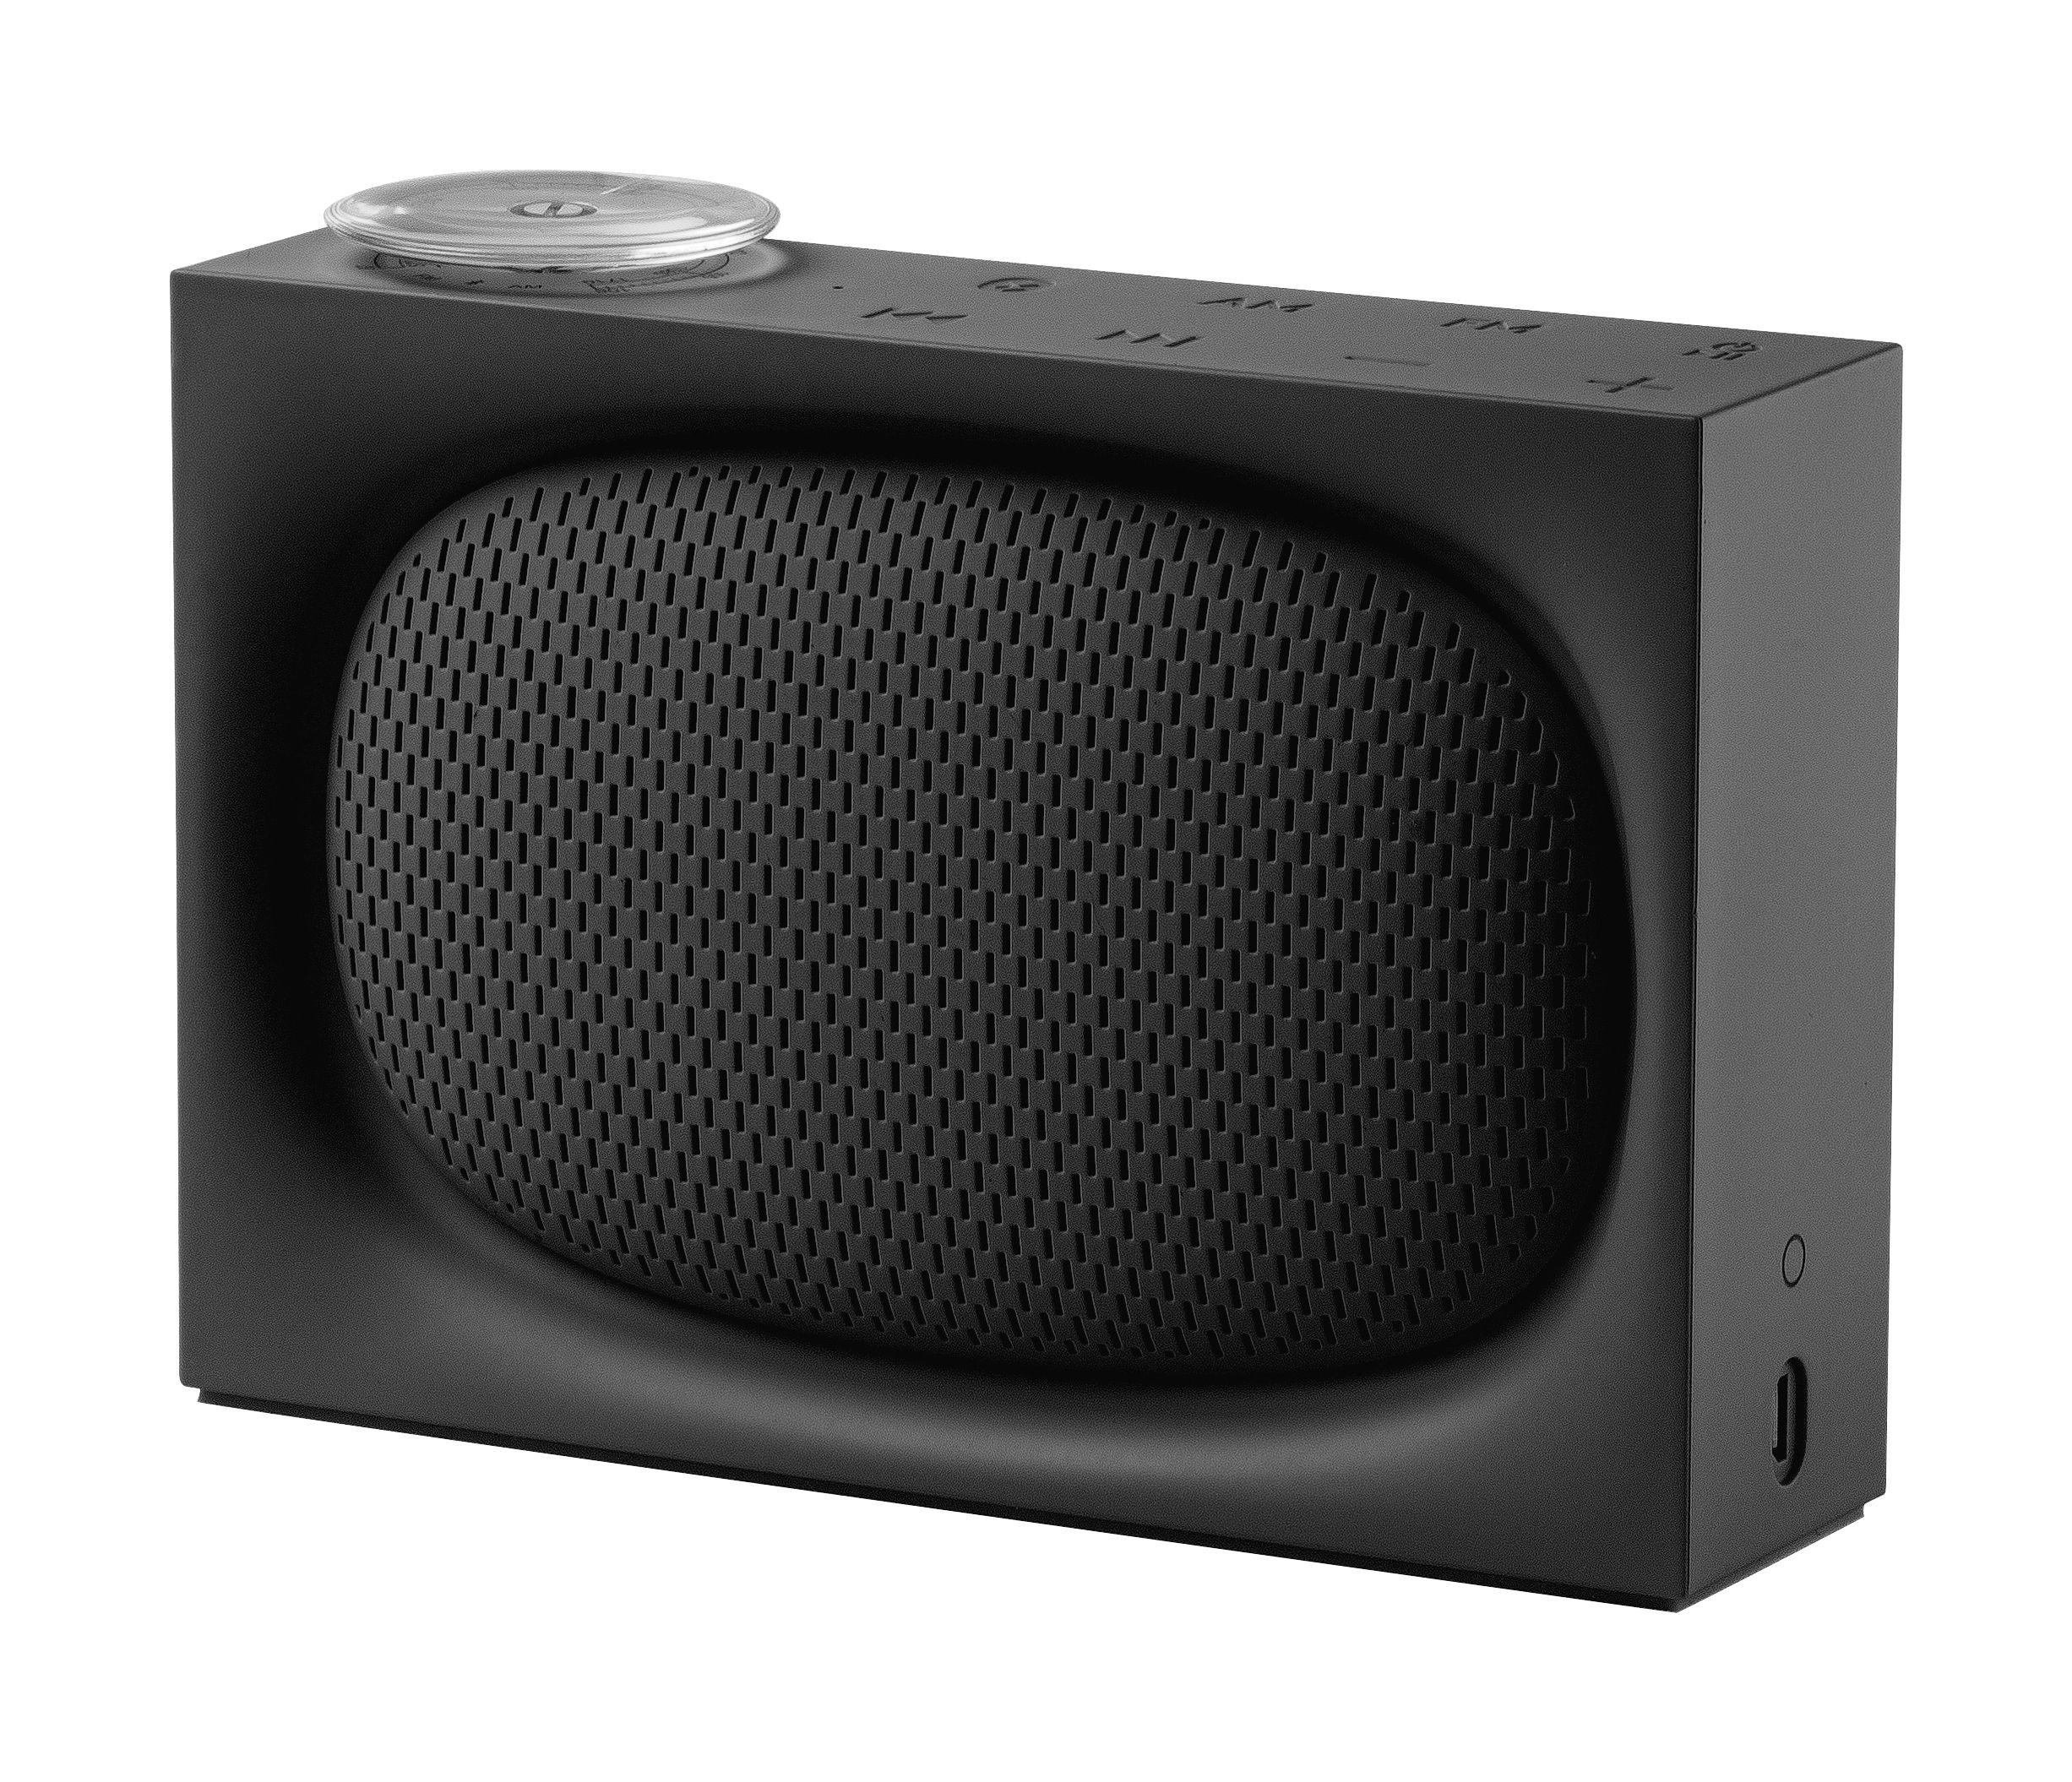 radio sans fil ona enceinte bluetooth recharge usb noir lexon. Black Bedroom Furniture Sets. Home Design Ideas